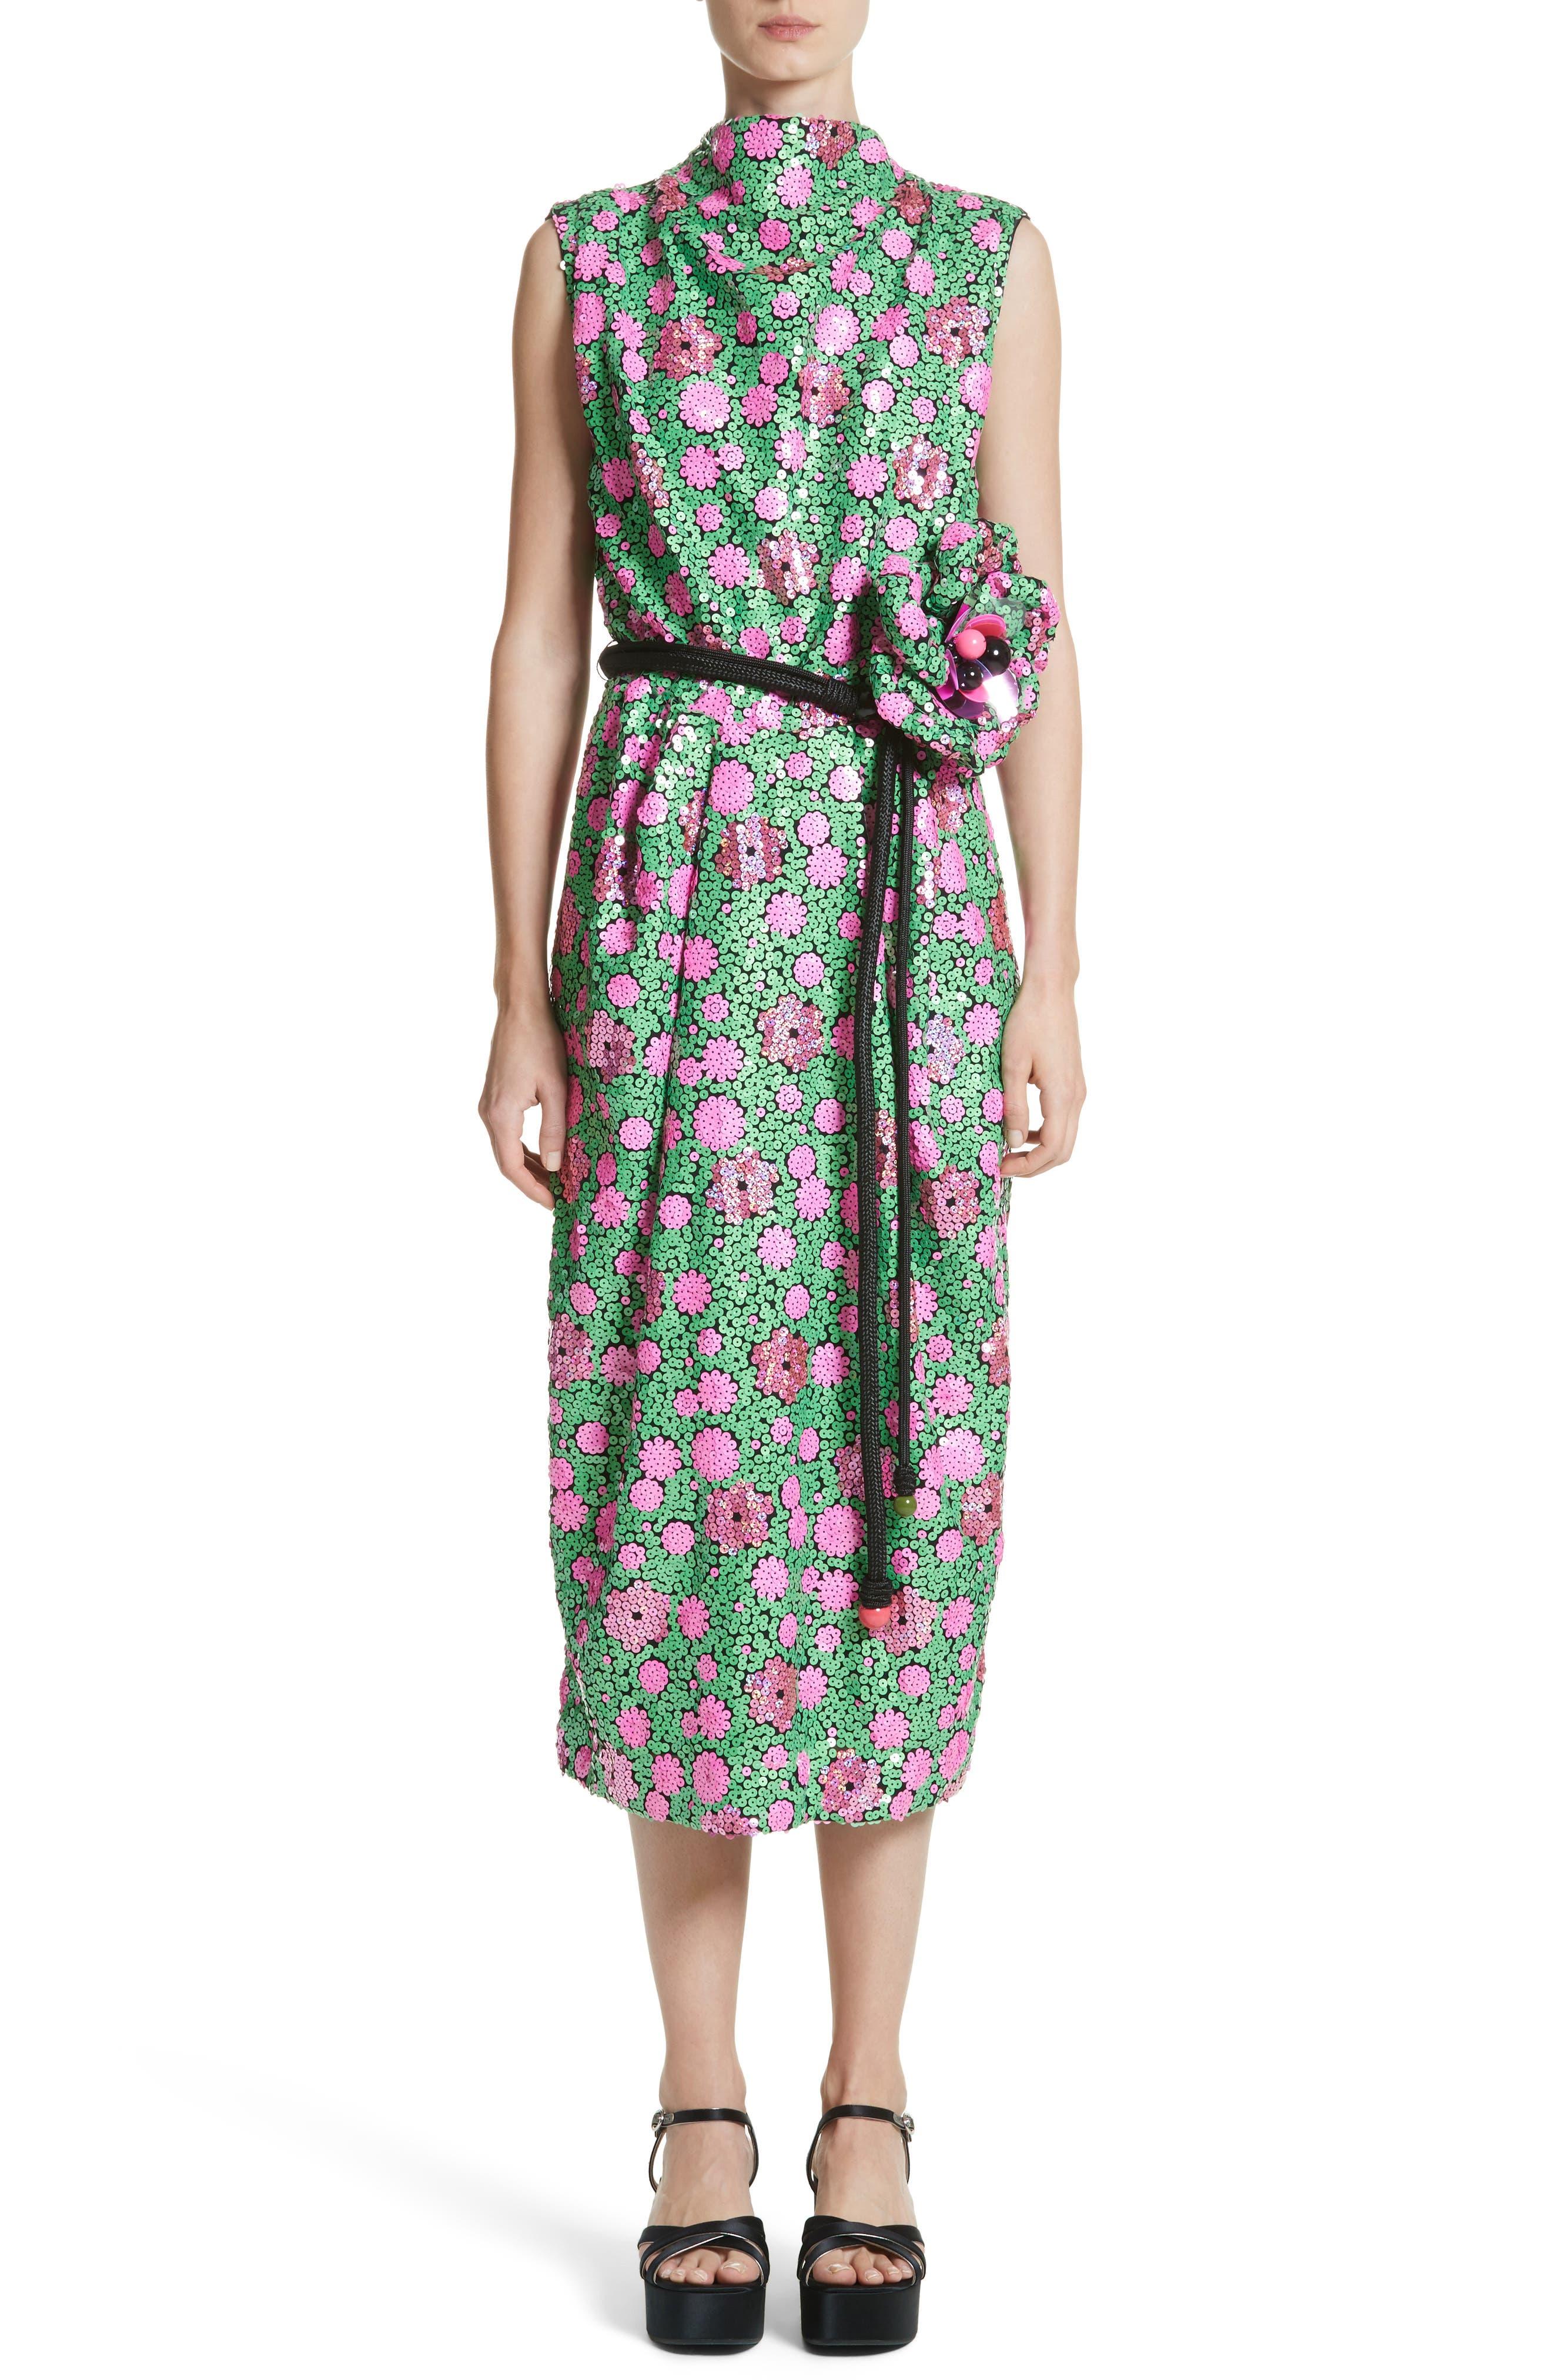 Floral Sequin Midi dress,                             Main thumbnail 1, color,                             300